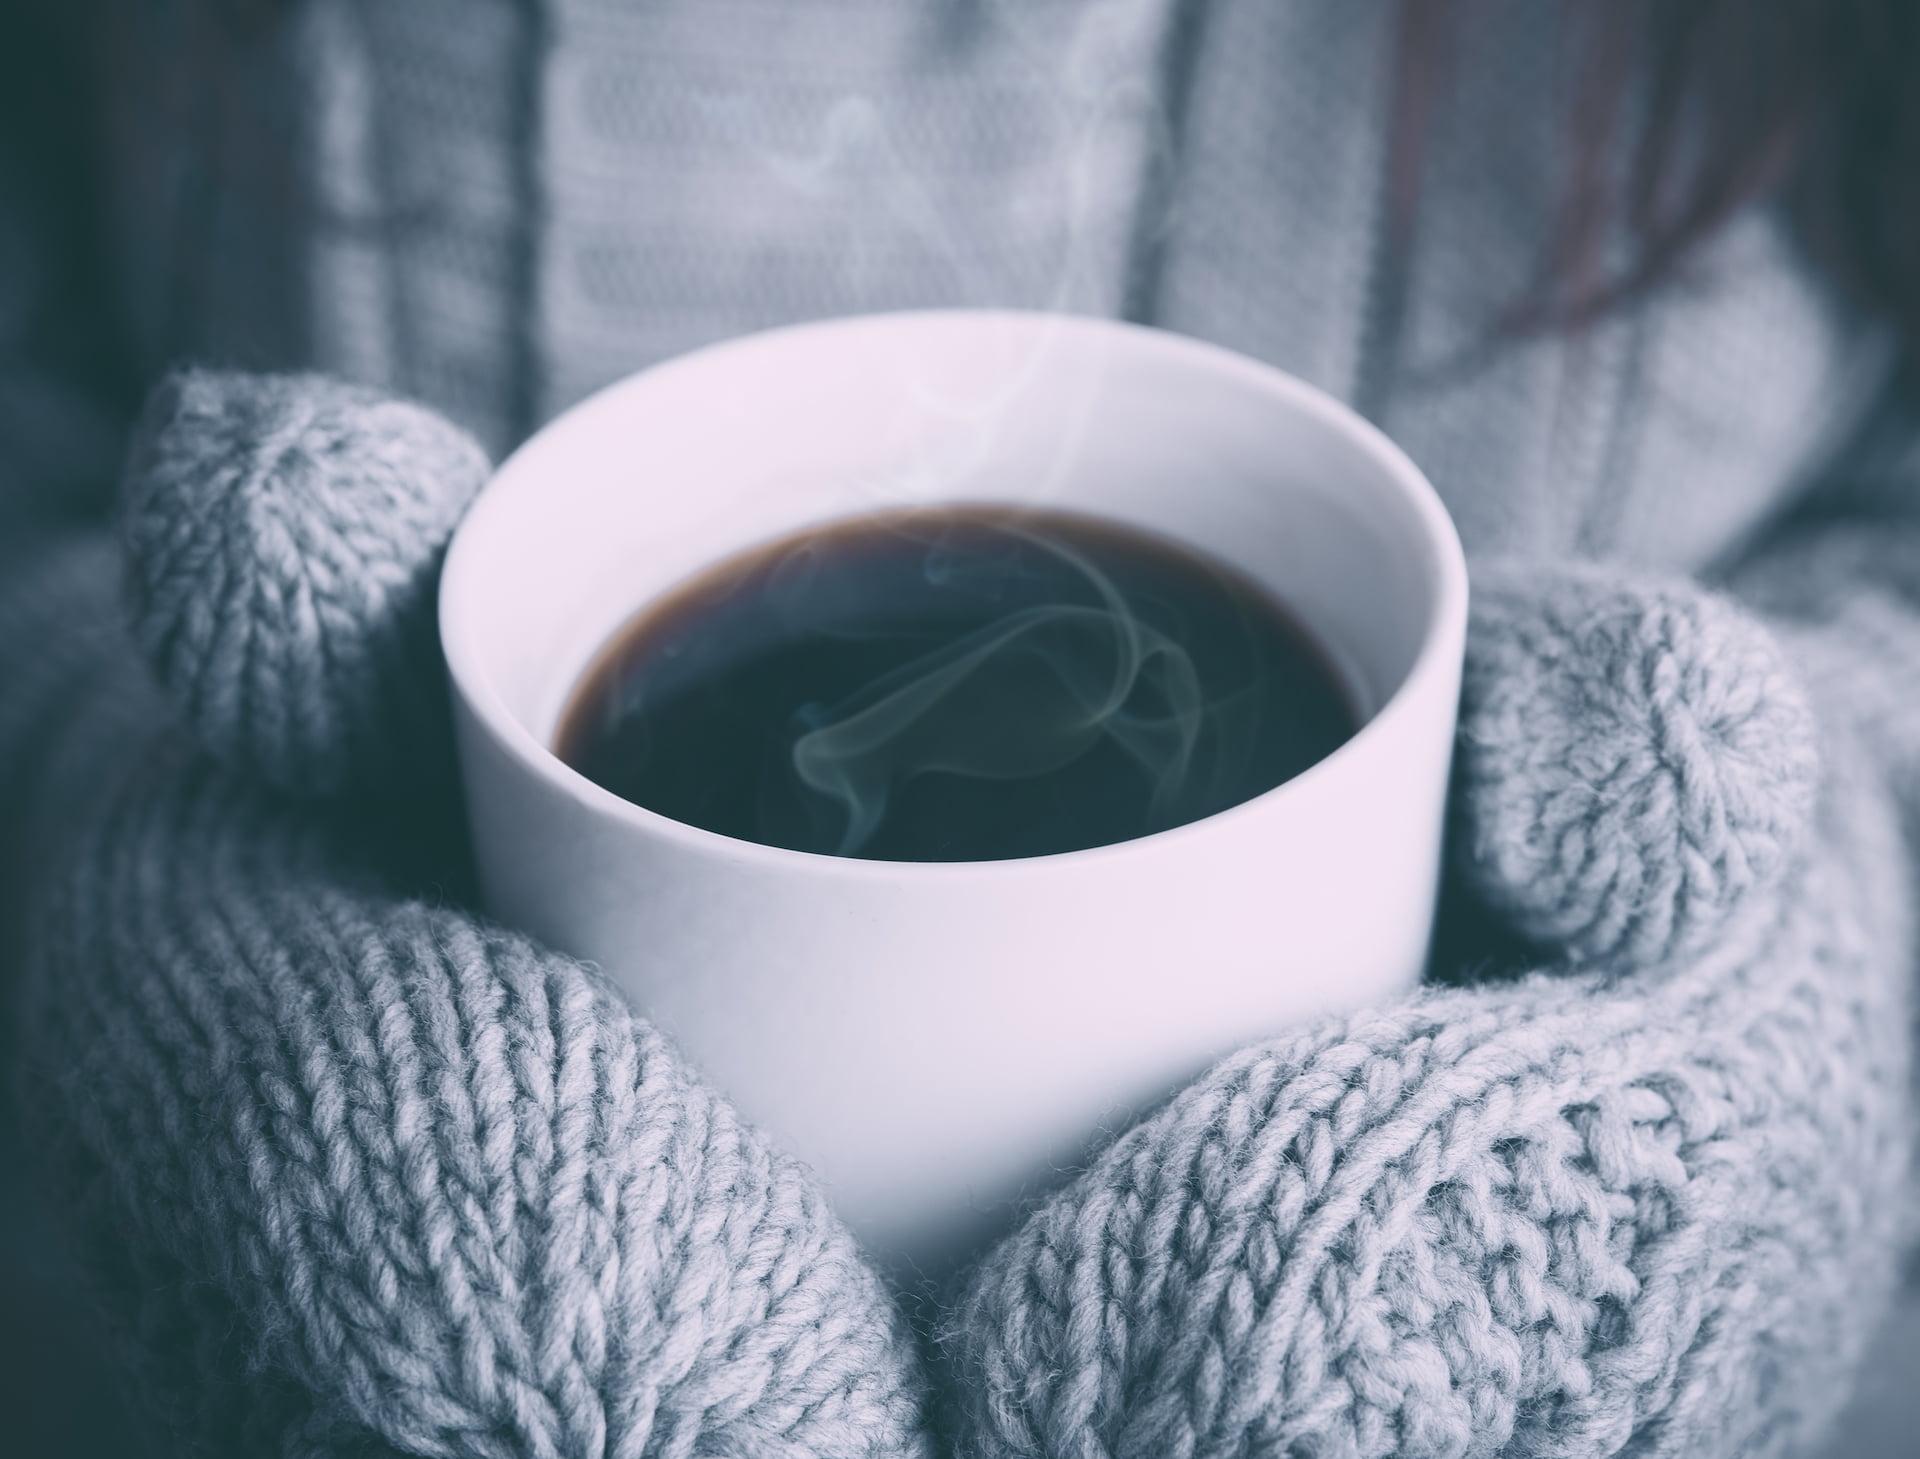 cold coffee steam gloves smoke 1 1 交錯的平行線 藝宇詩選